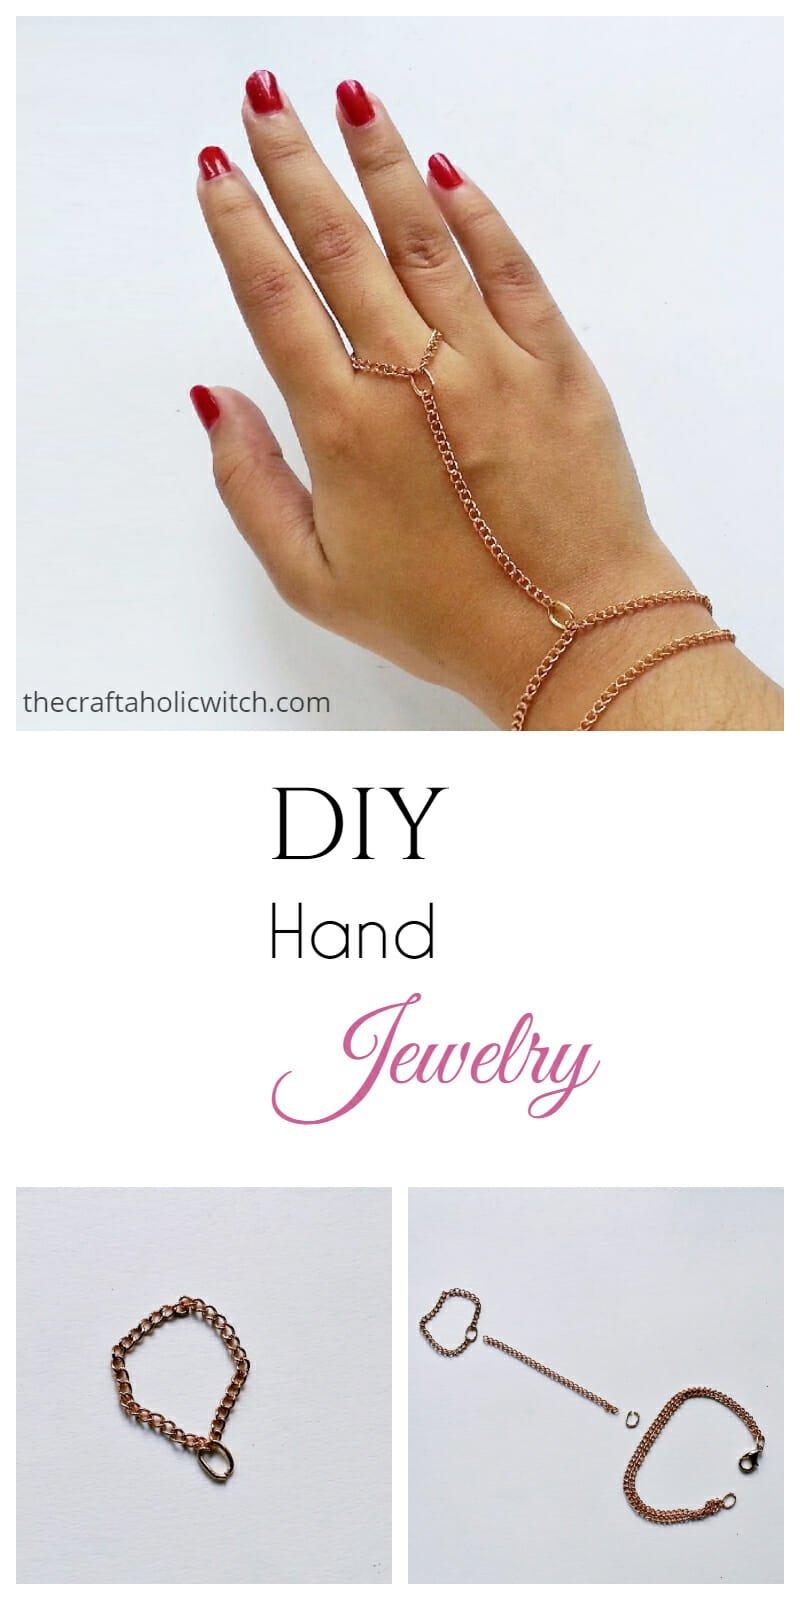 DIY Hand Jewelry